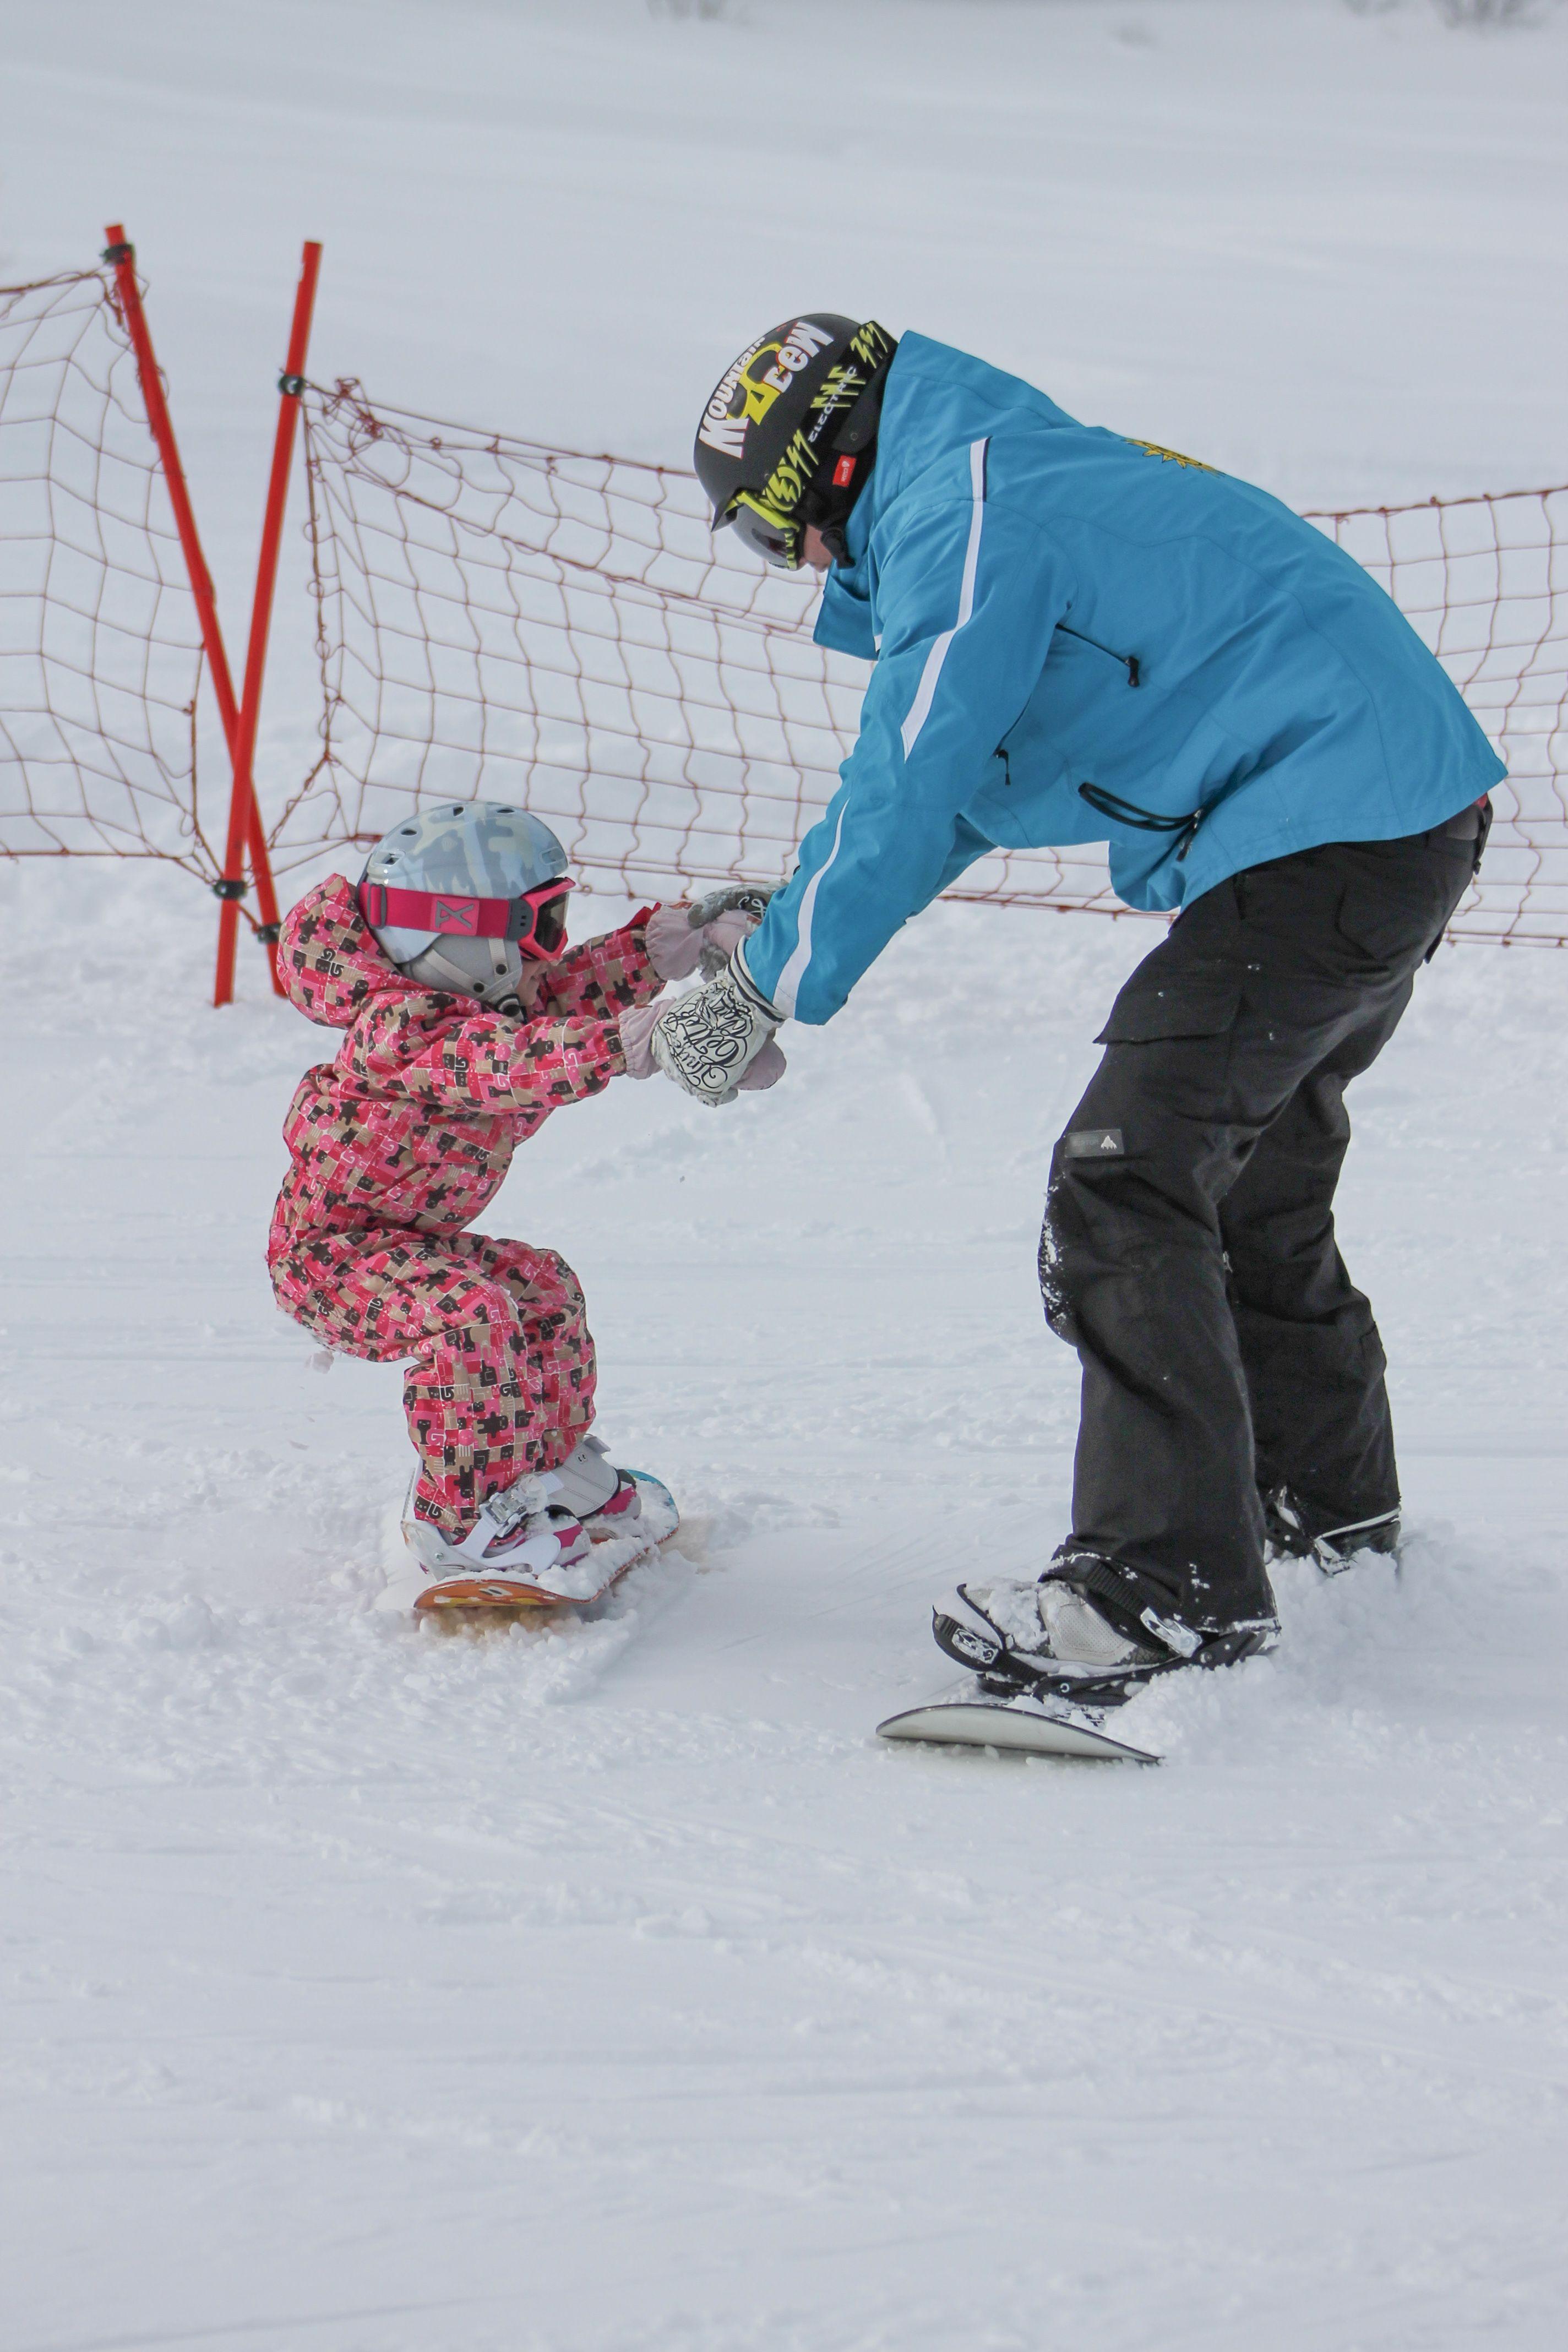 A Snowboarding Private Lesson Kids Snowboarding Snowboarding Ski And Snowboard